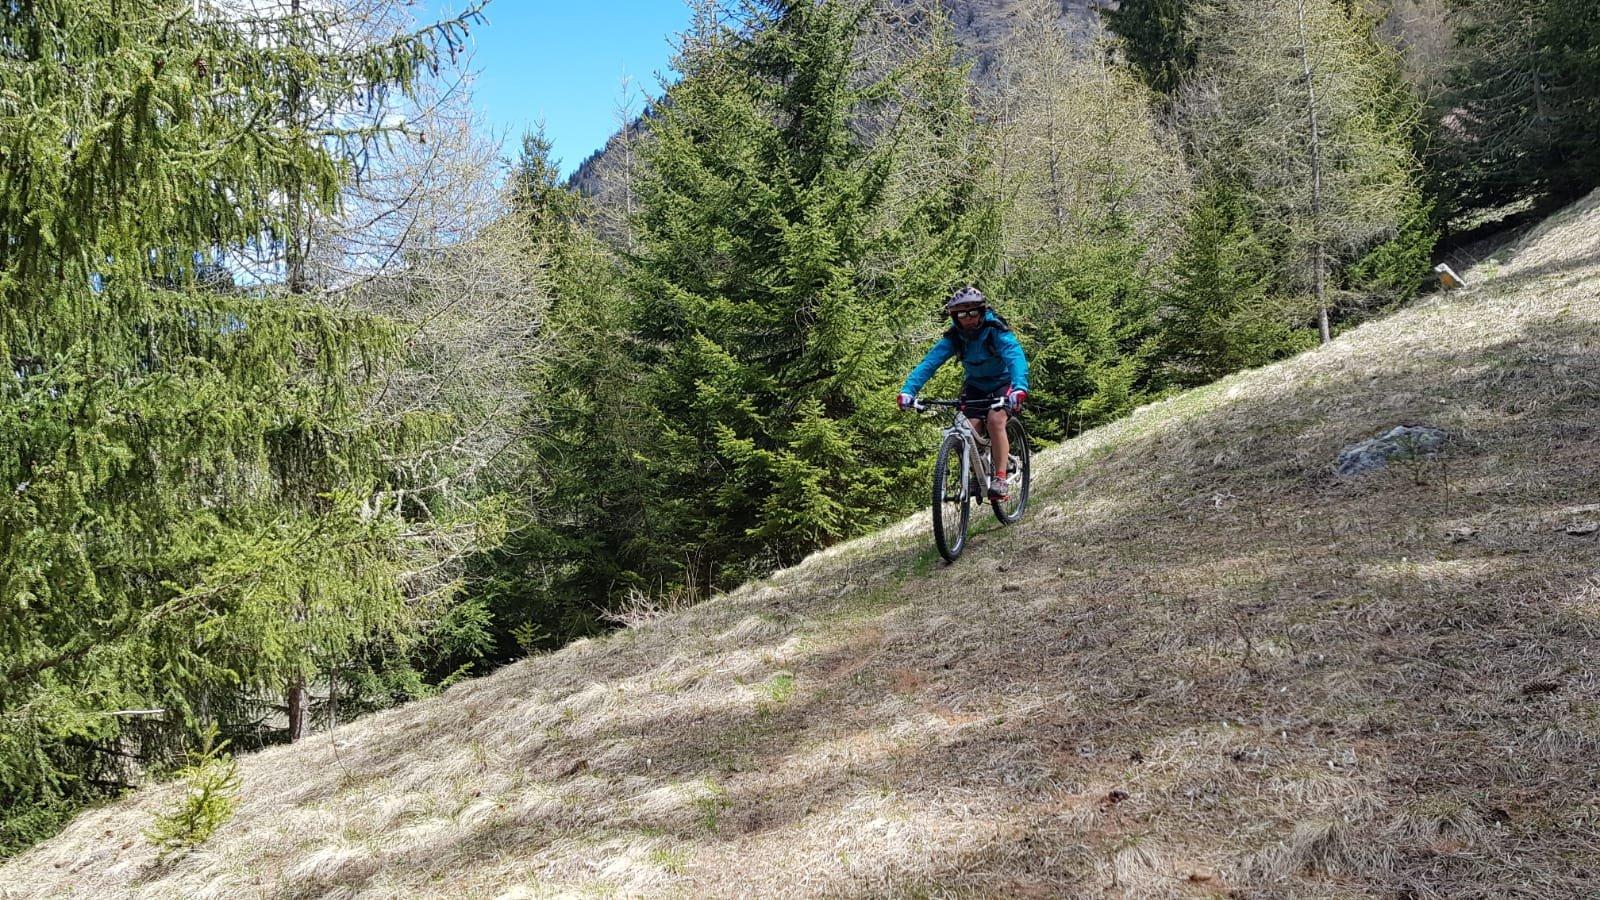 Praperiaz (Alpeggio) da Roisan, giro per Preil 2019-05-04